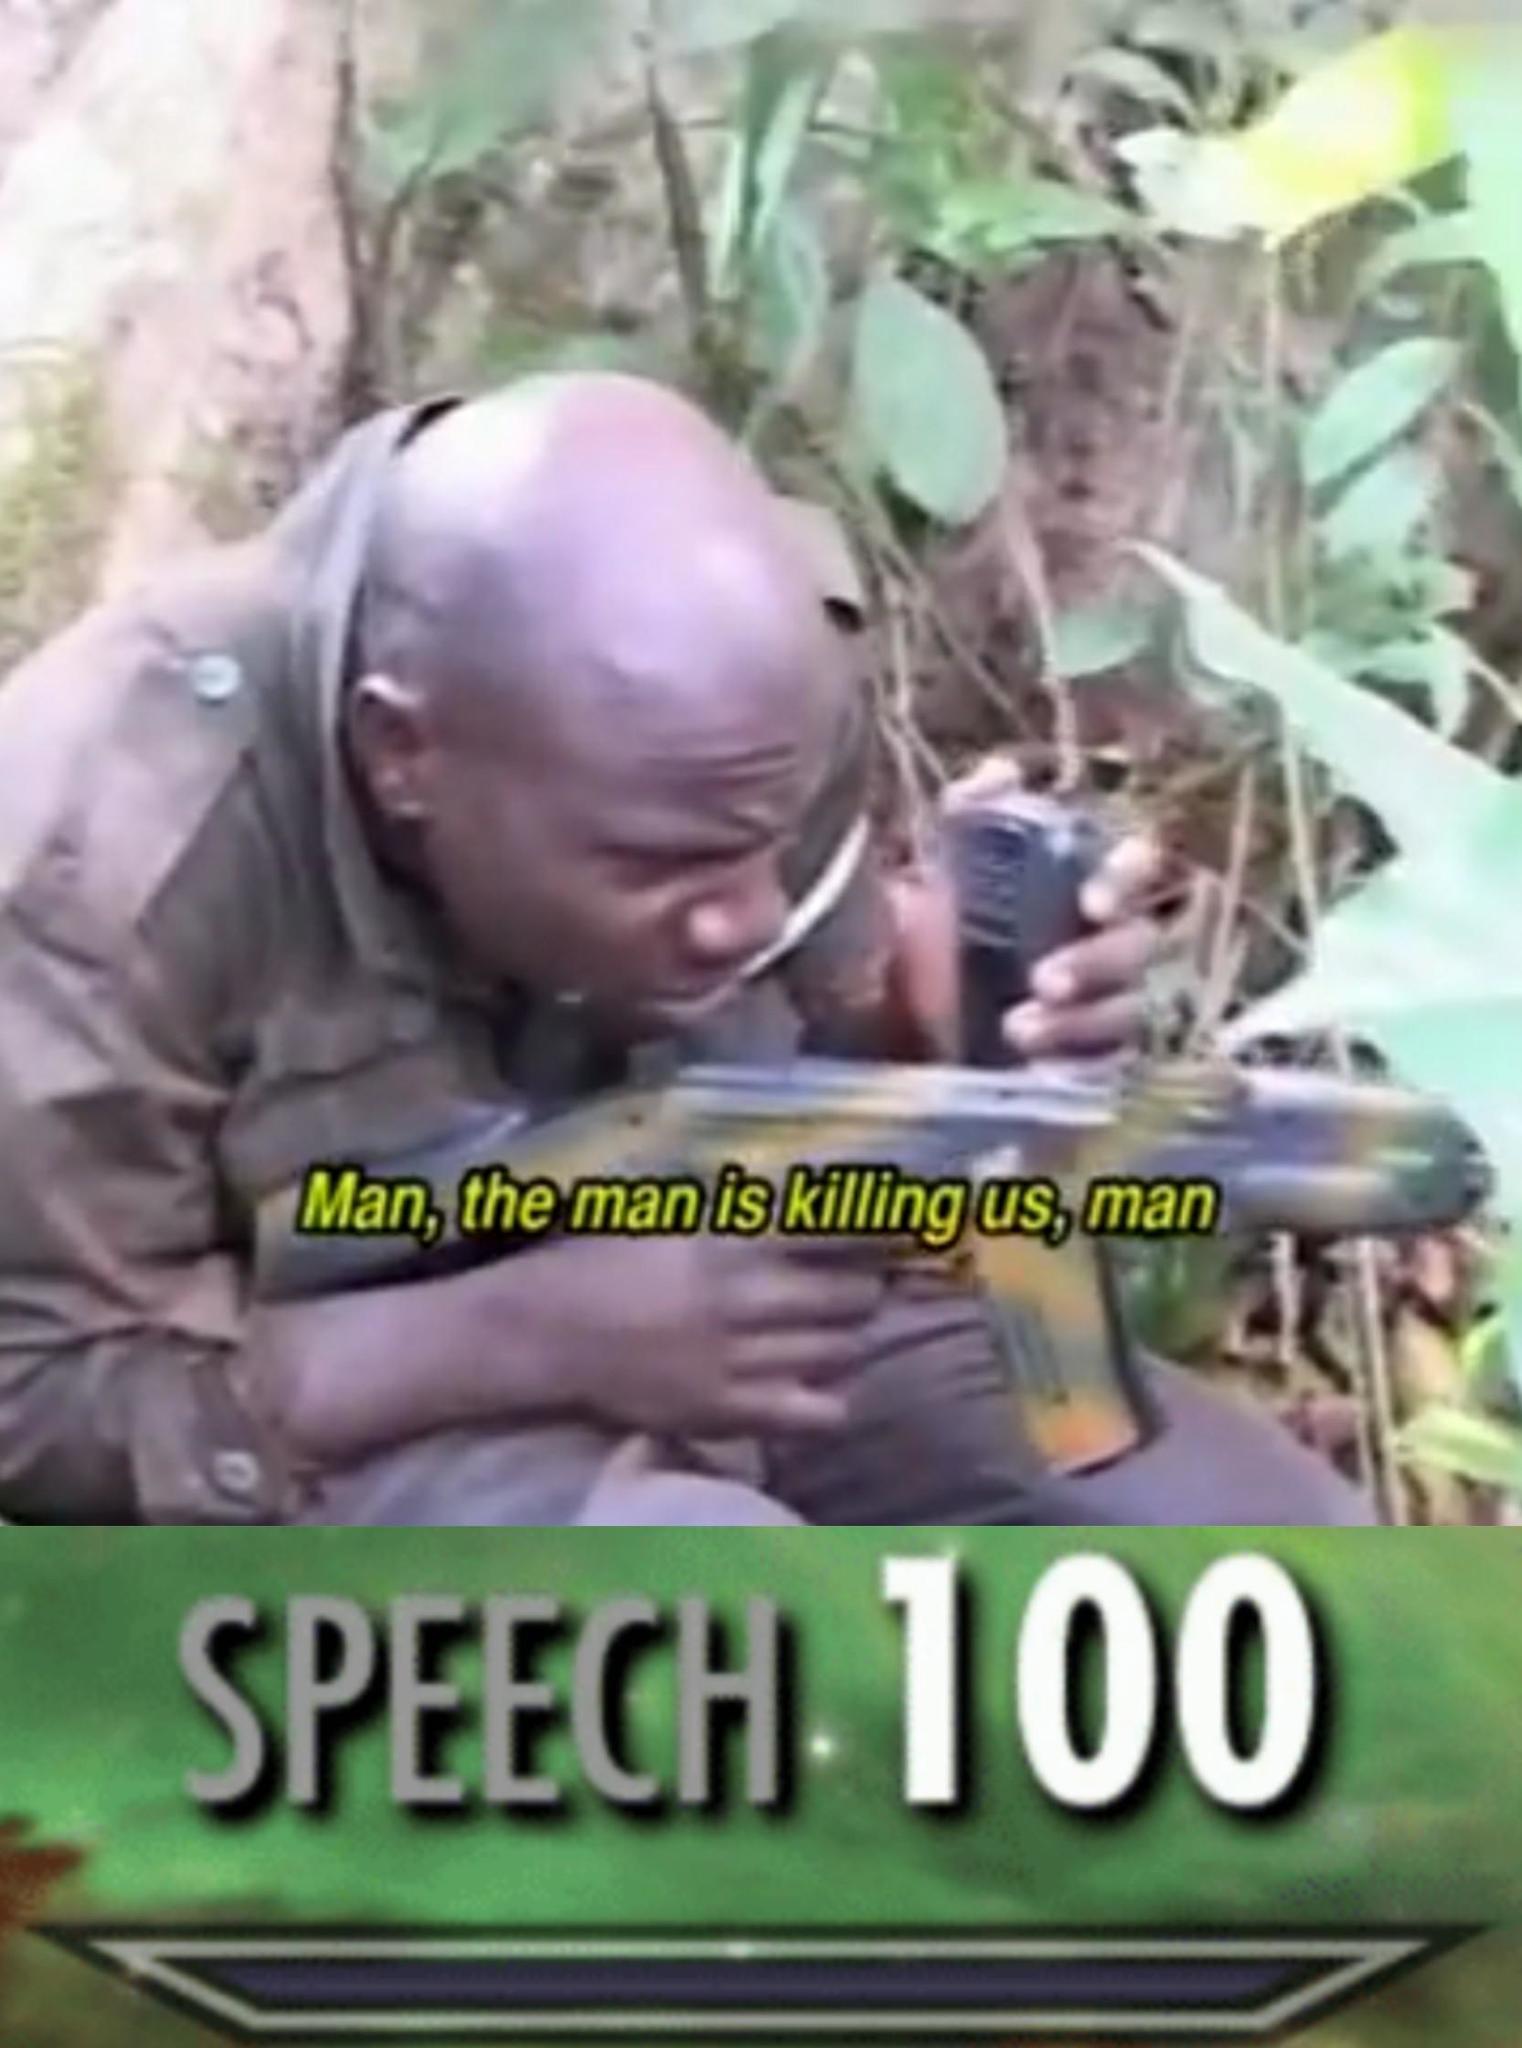 Best Ugandan movie, change my mind - meme